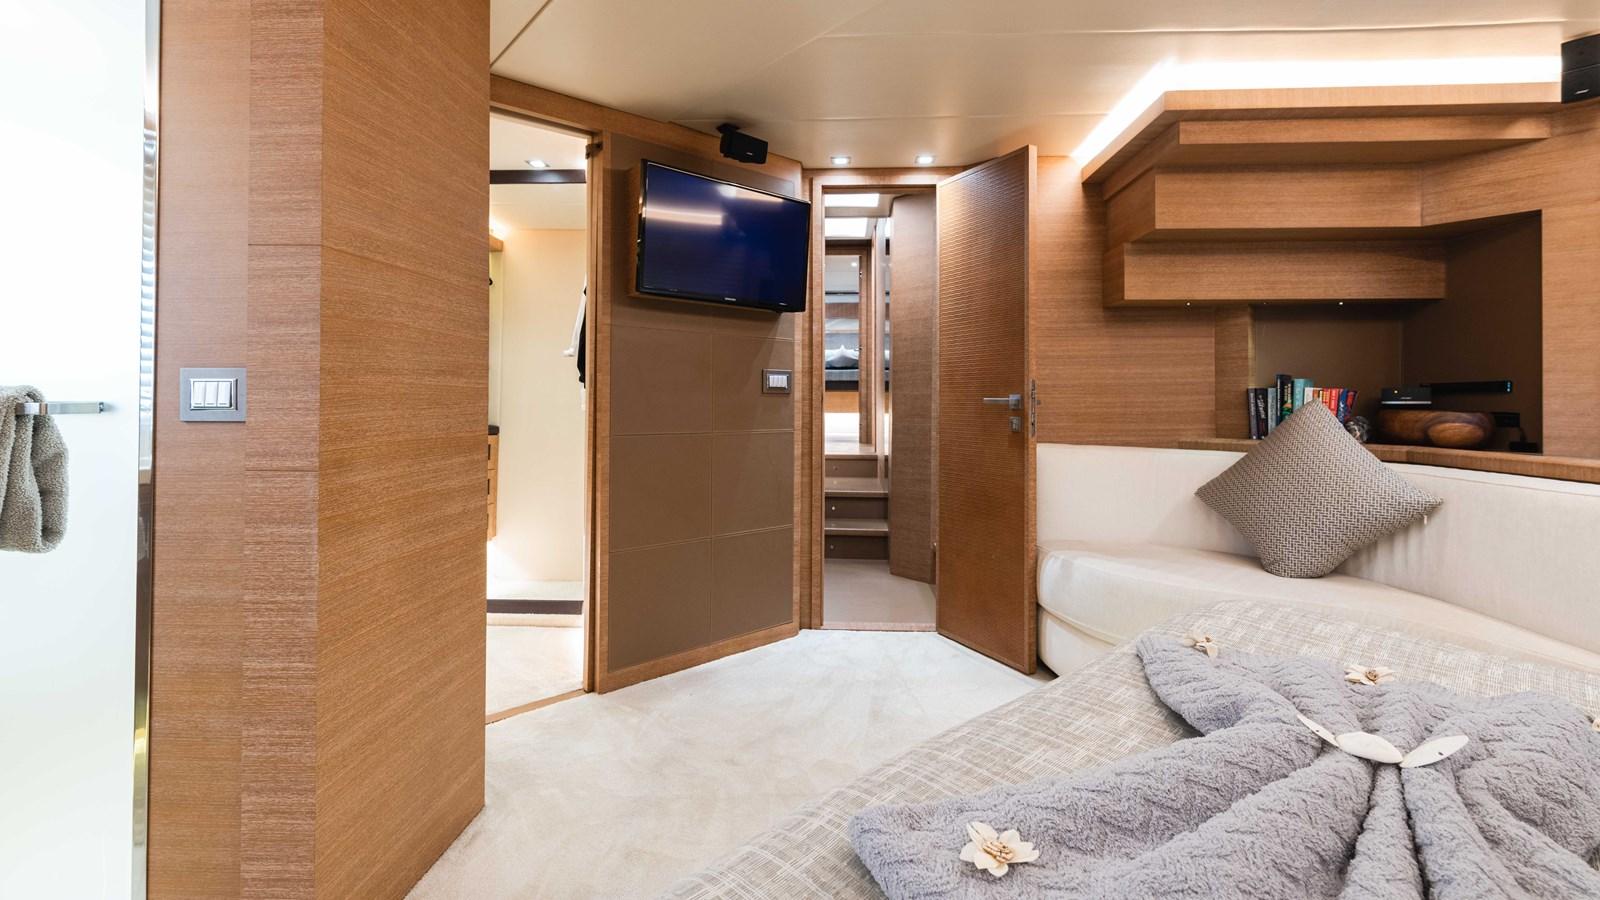 76 Monte Carlo (24 of 127) 2014 MONTE CARLO YACHTS Motoryacht Motor Yacht 2825171